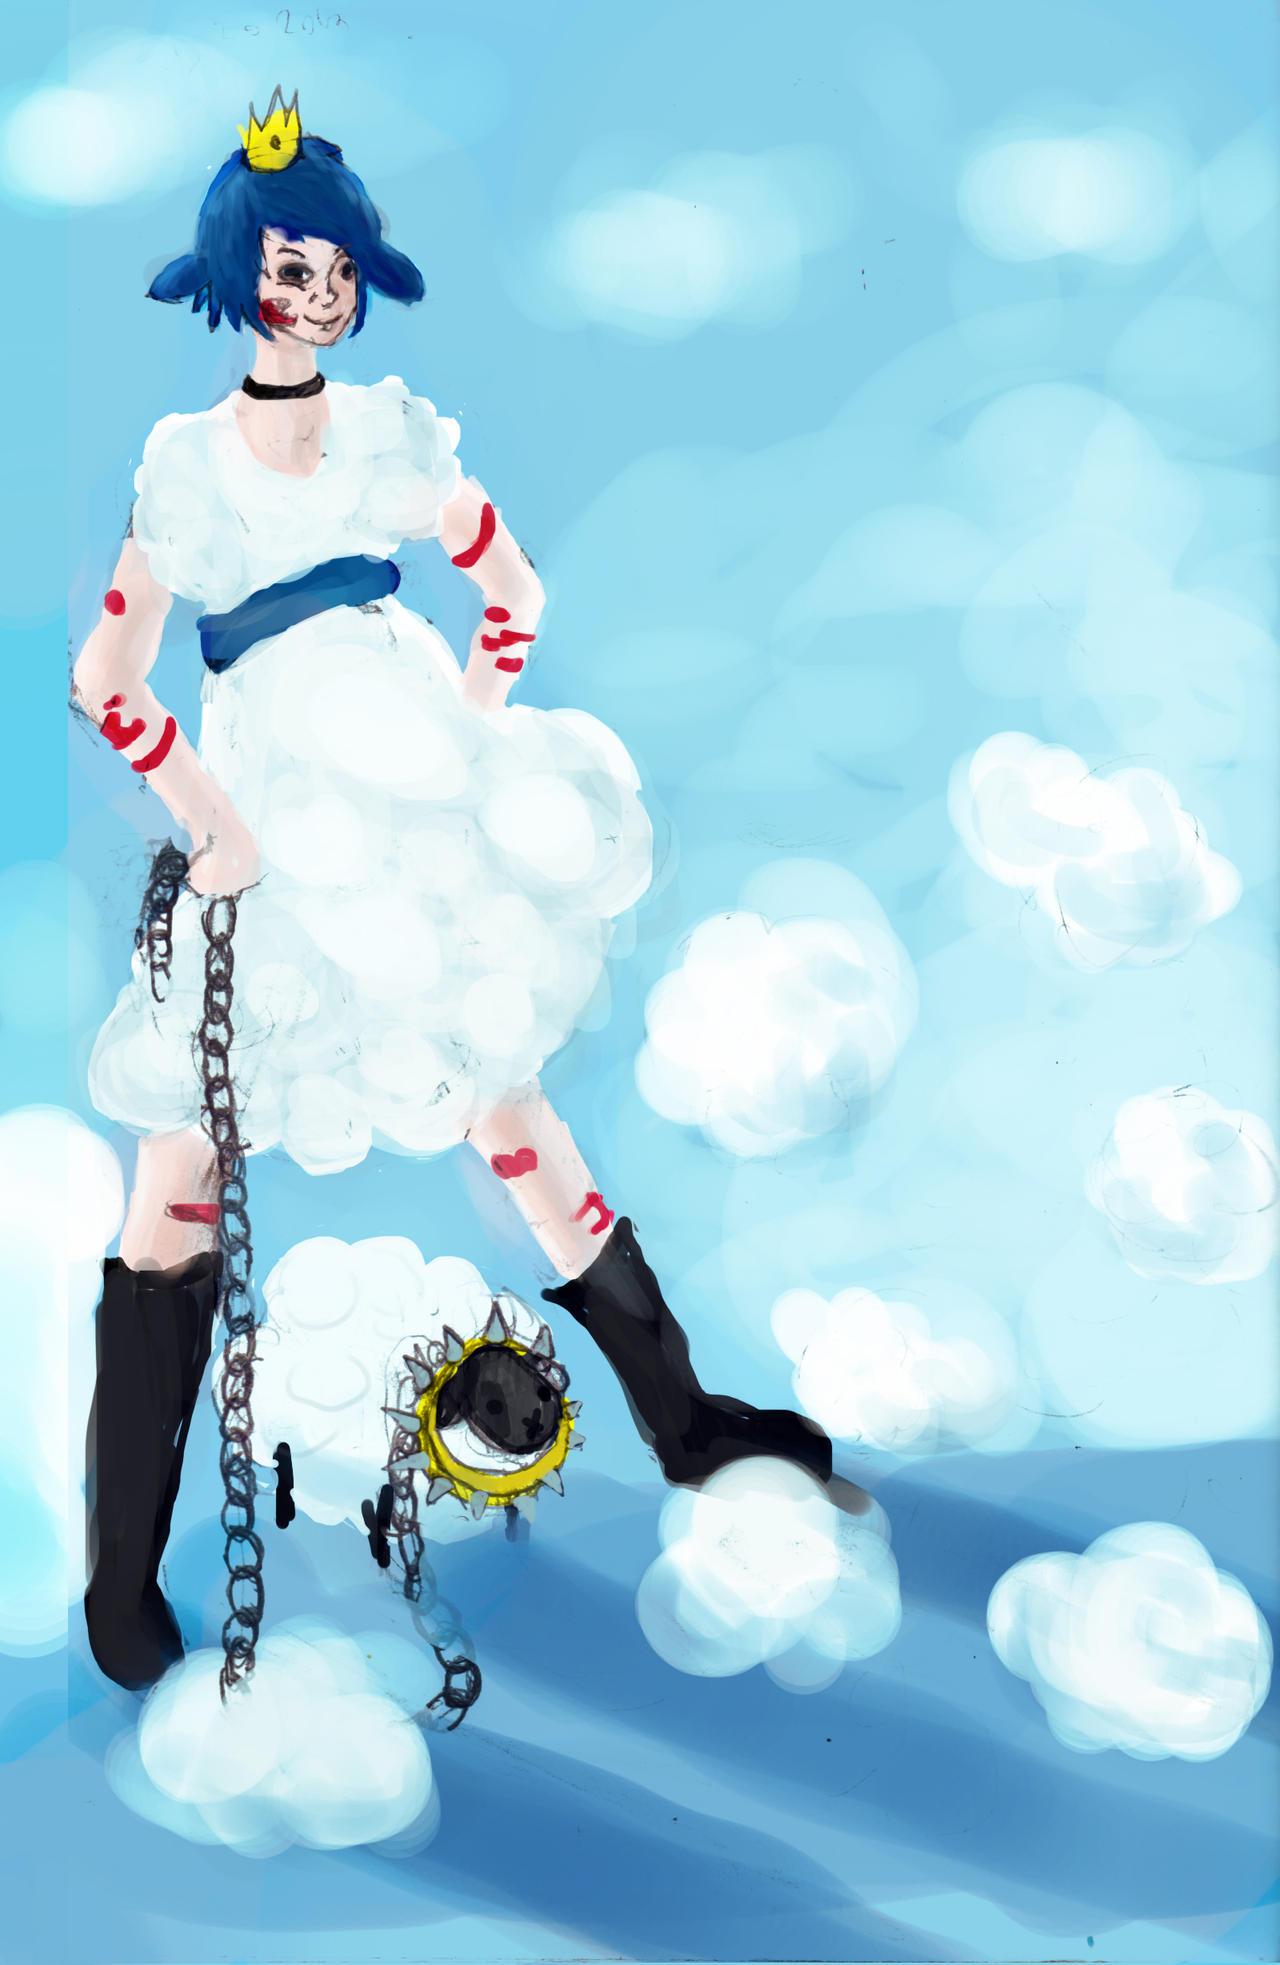 Princess Baa and Sheepbeast by SoothSheeper